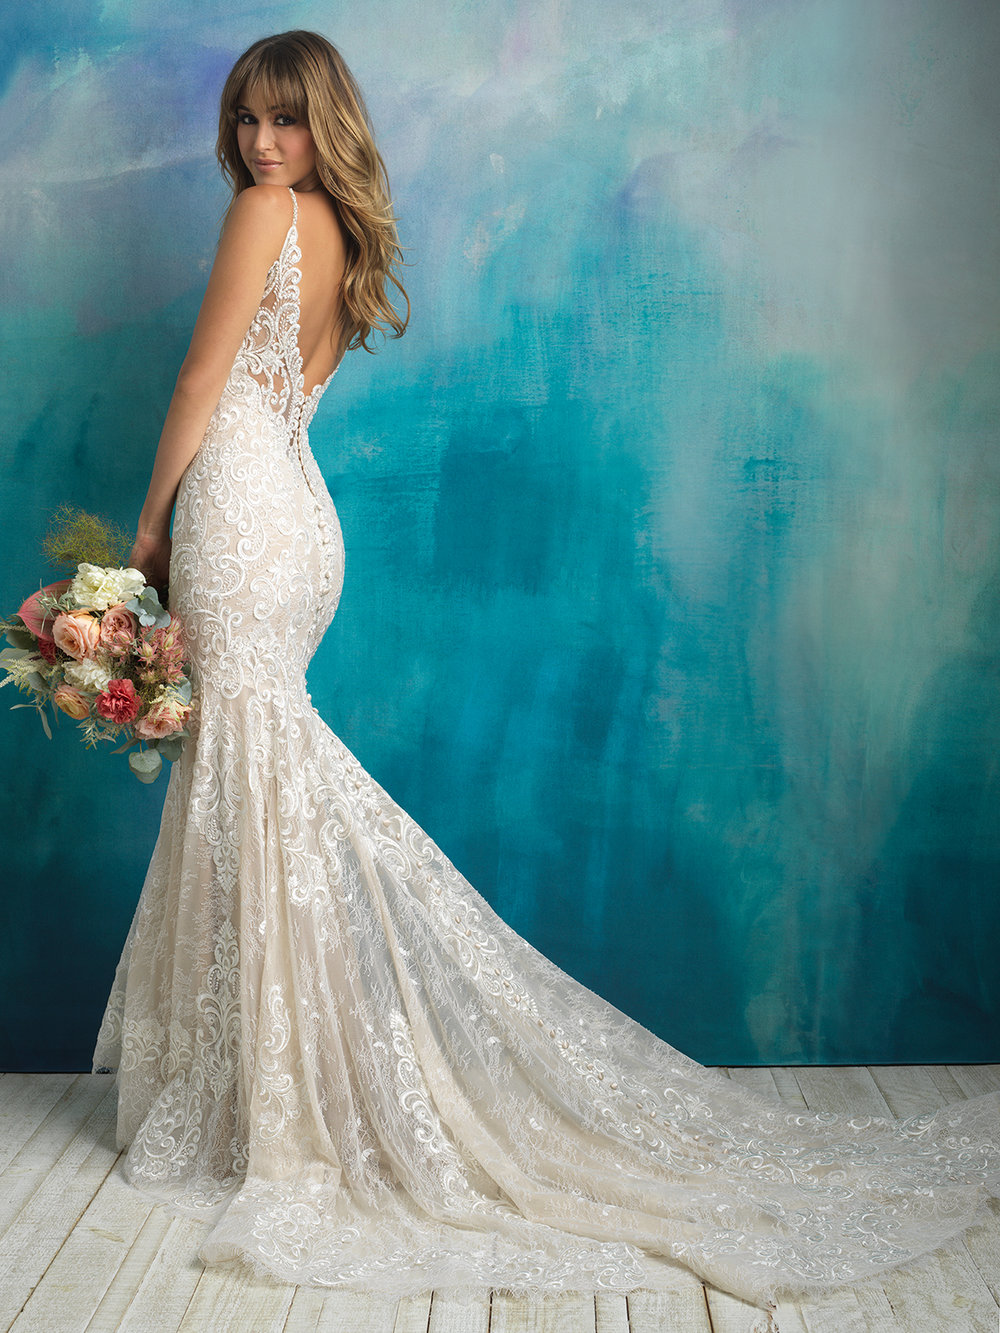 Allure Bridals   *$1000-$2500